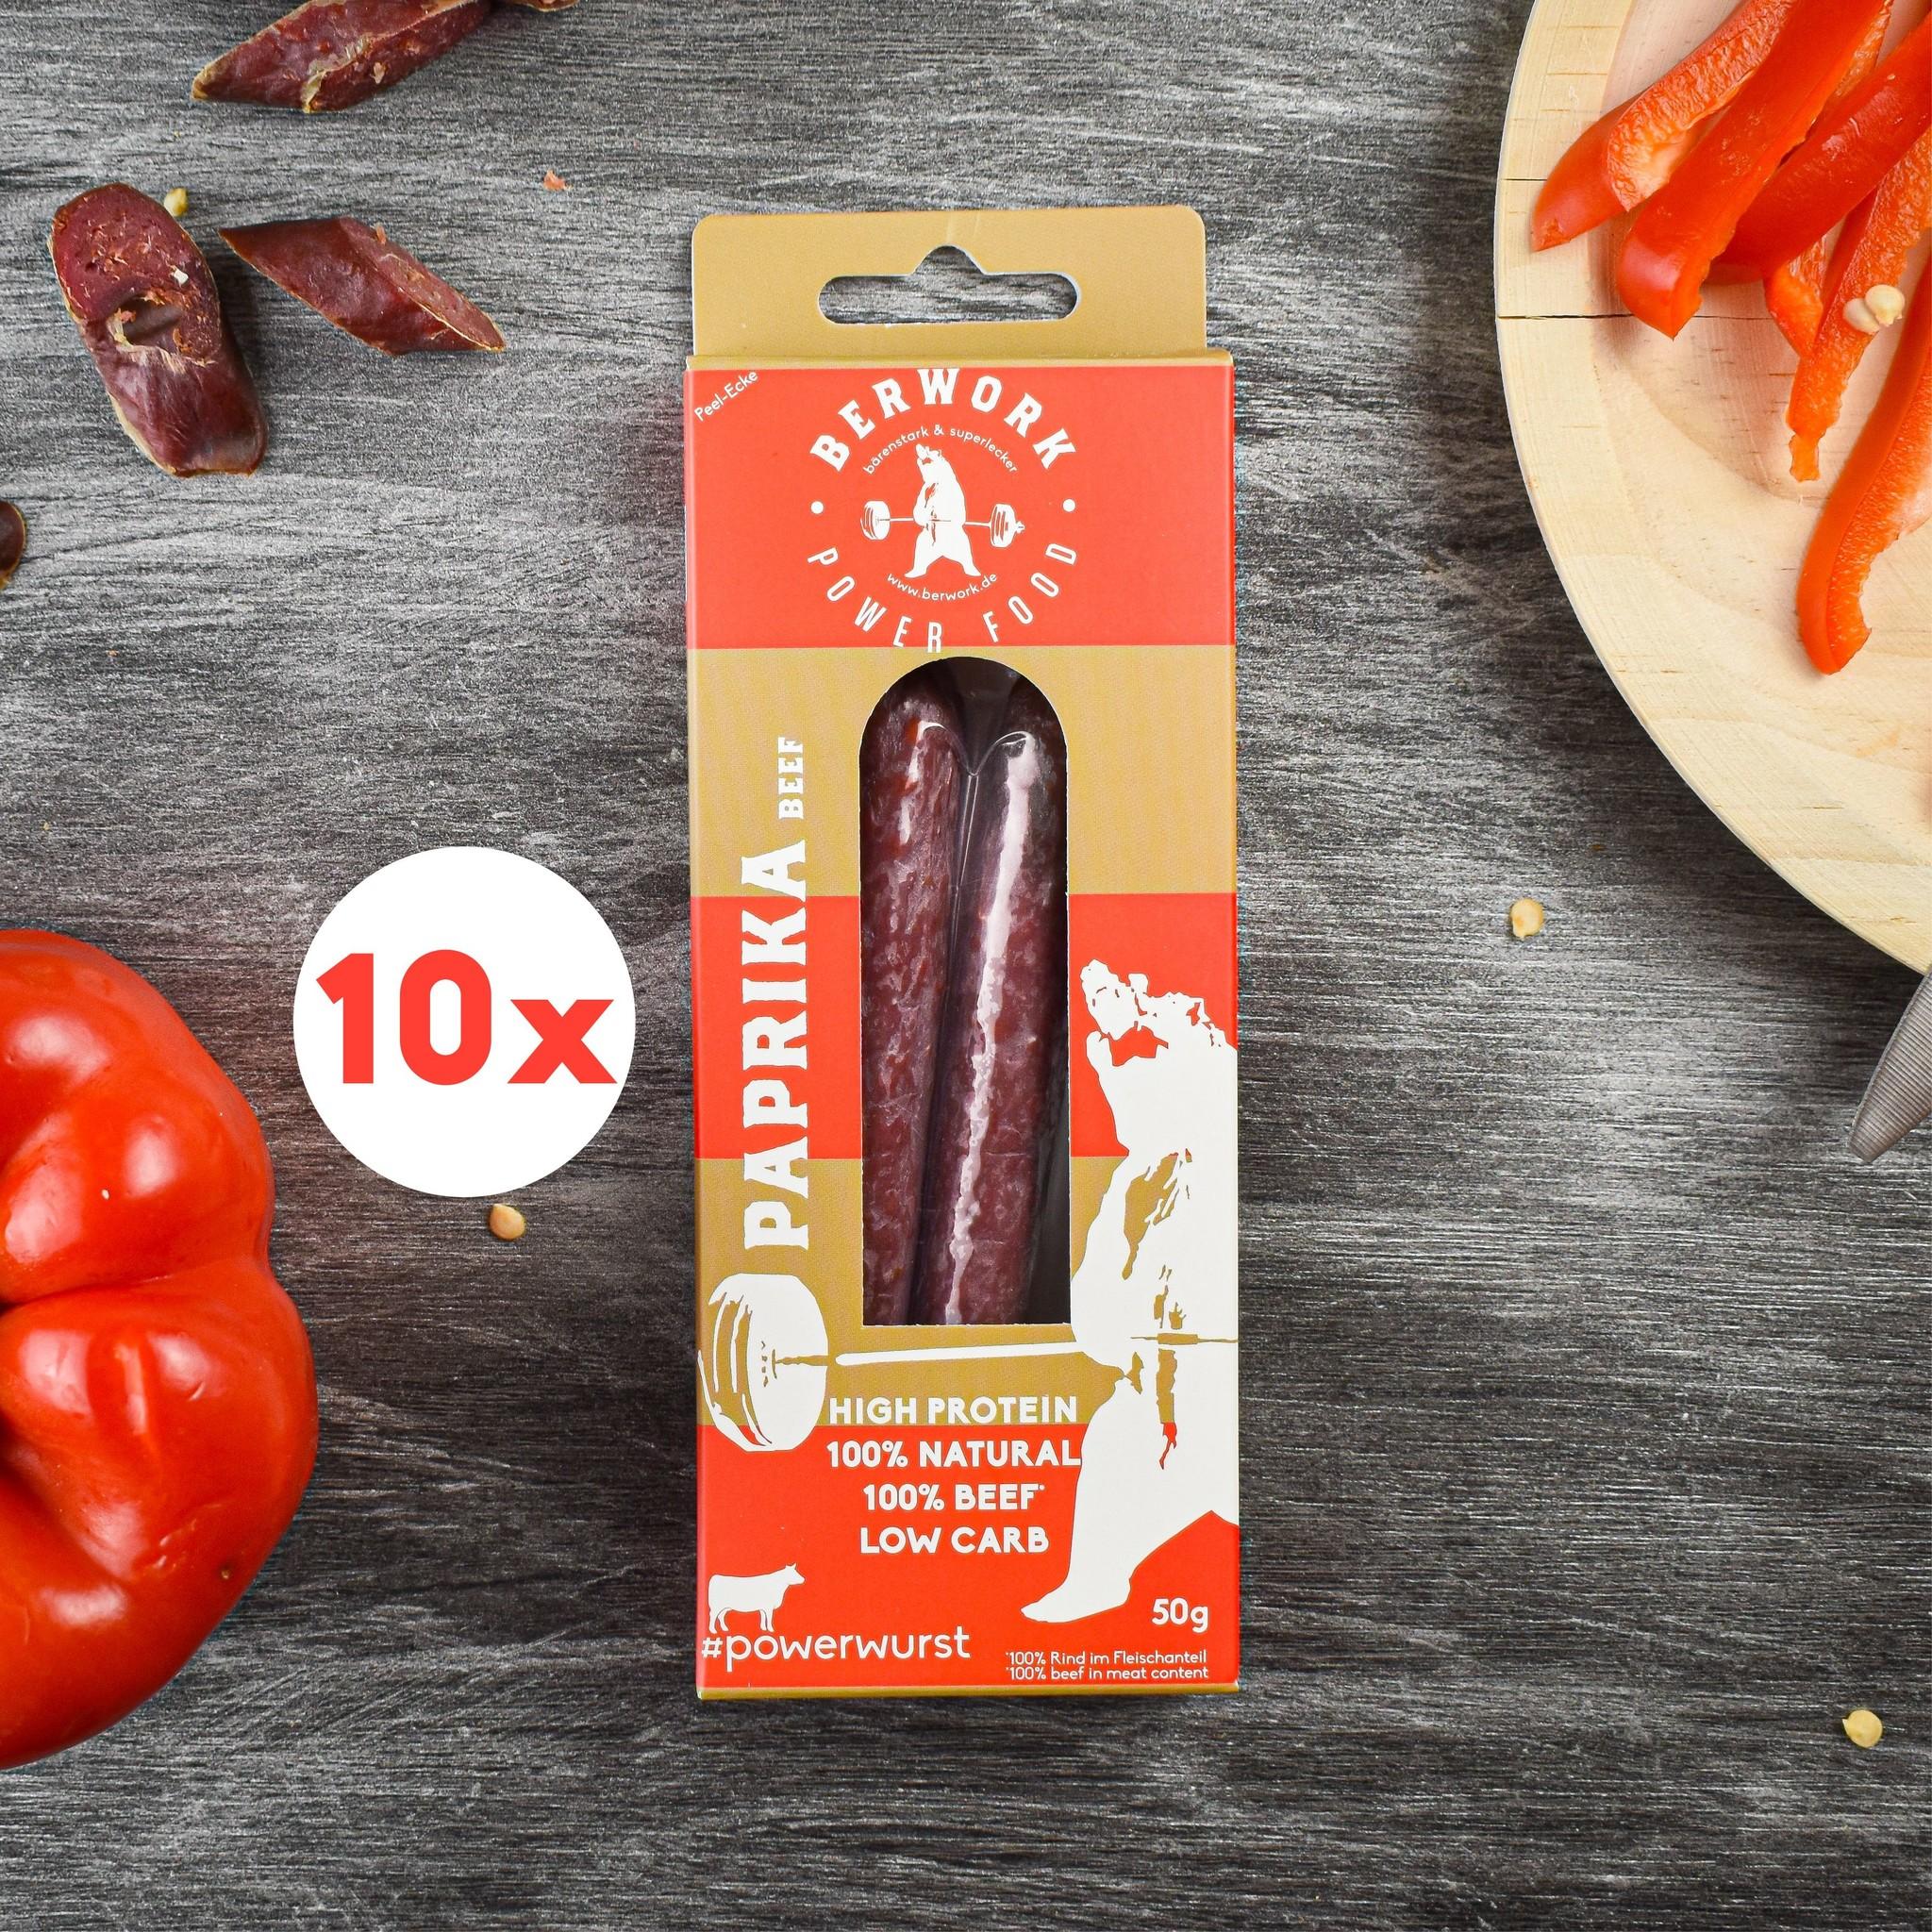 berwork Powerwurst Paprika Storage Pack Beef (500g)